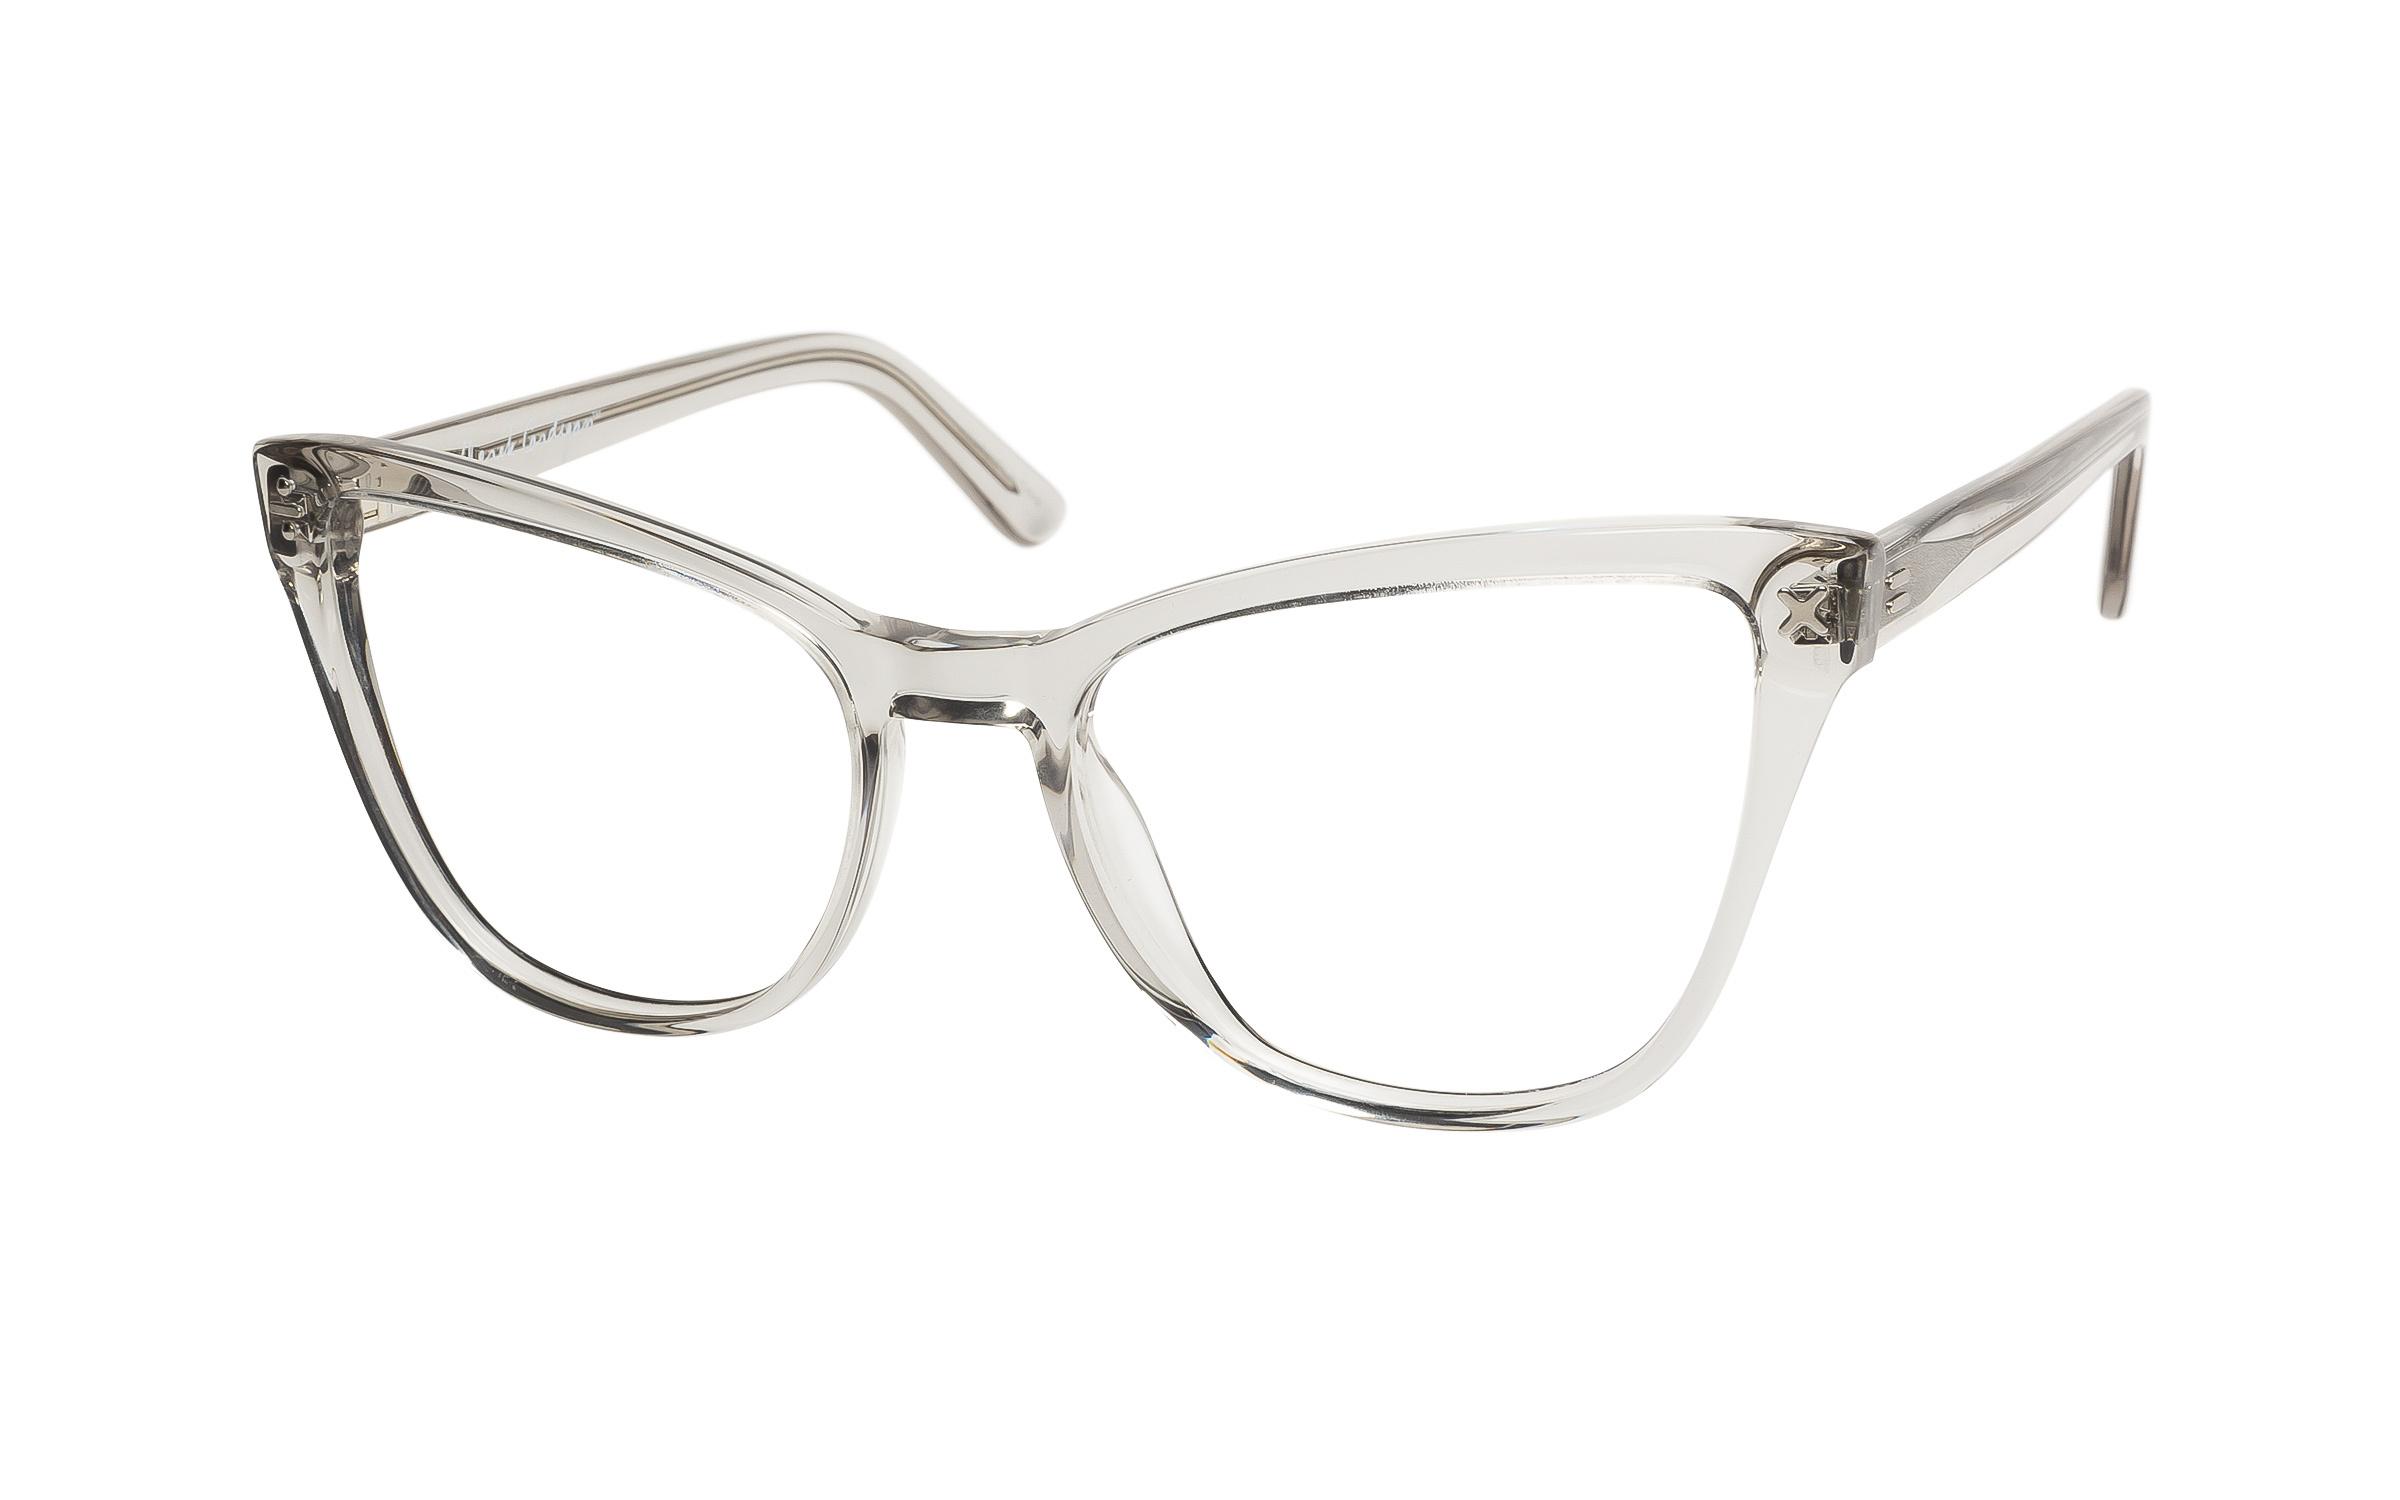 Women's Vintage Glasses Clear Derek Cardigan Online Clearly